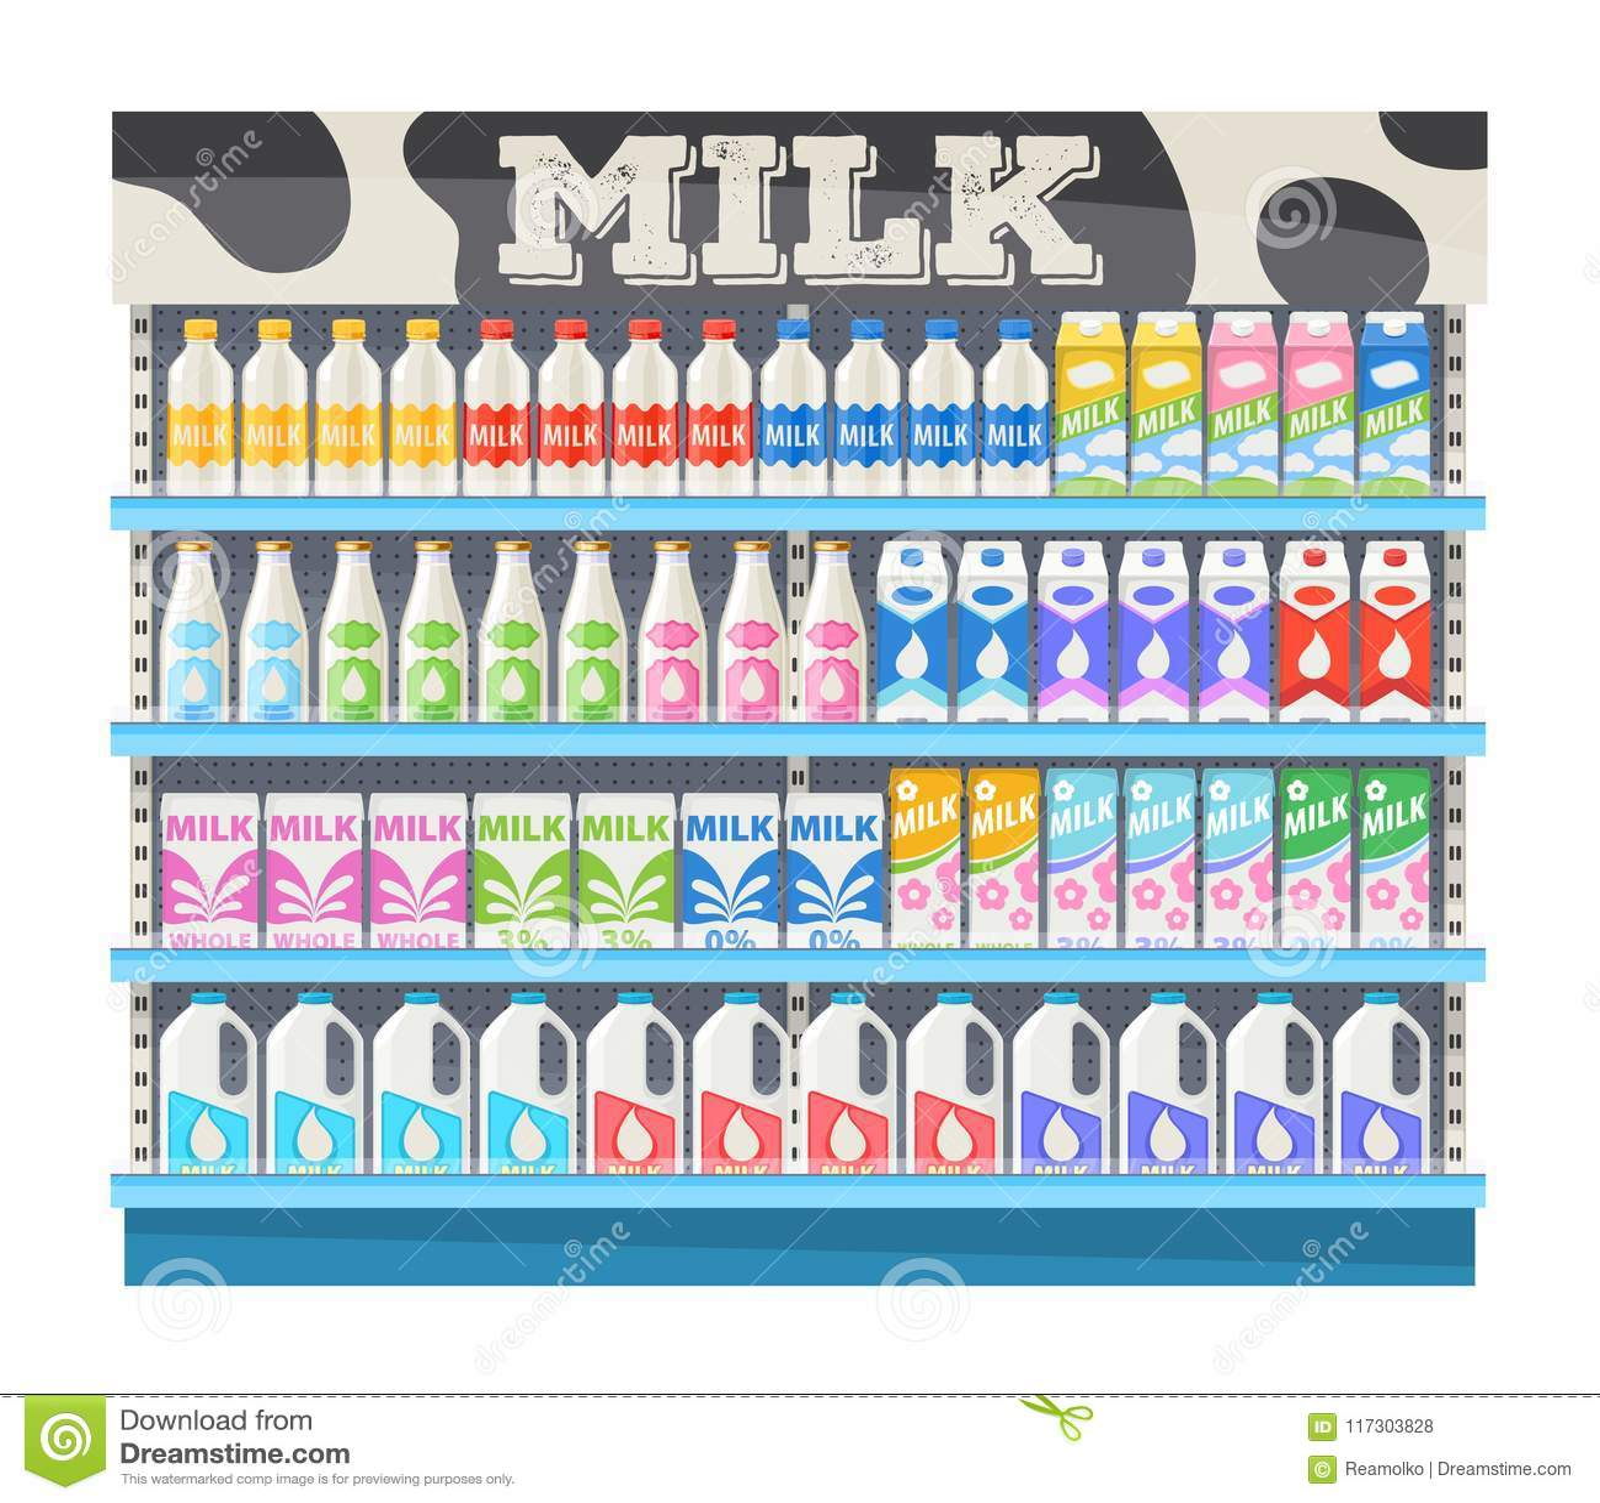 supermarket shelf display with milk stock vector illustration of